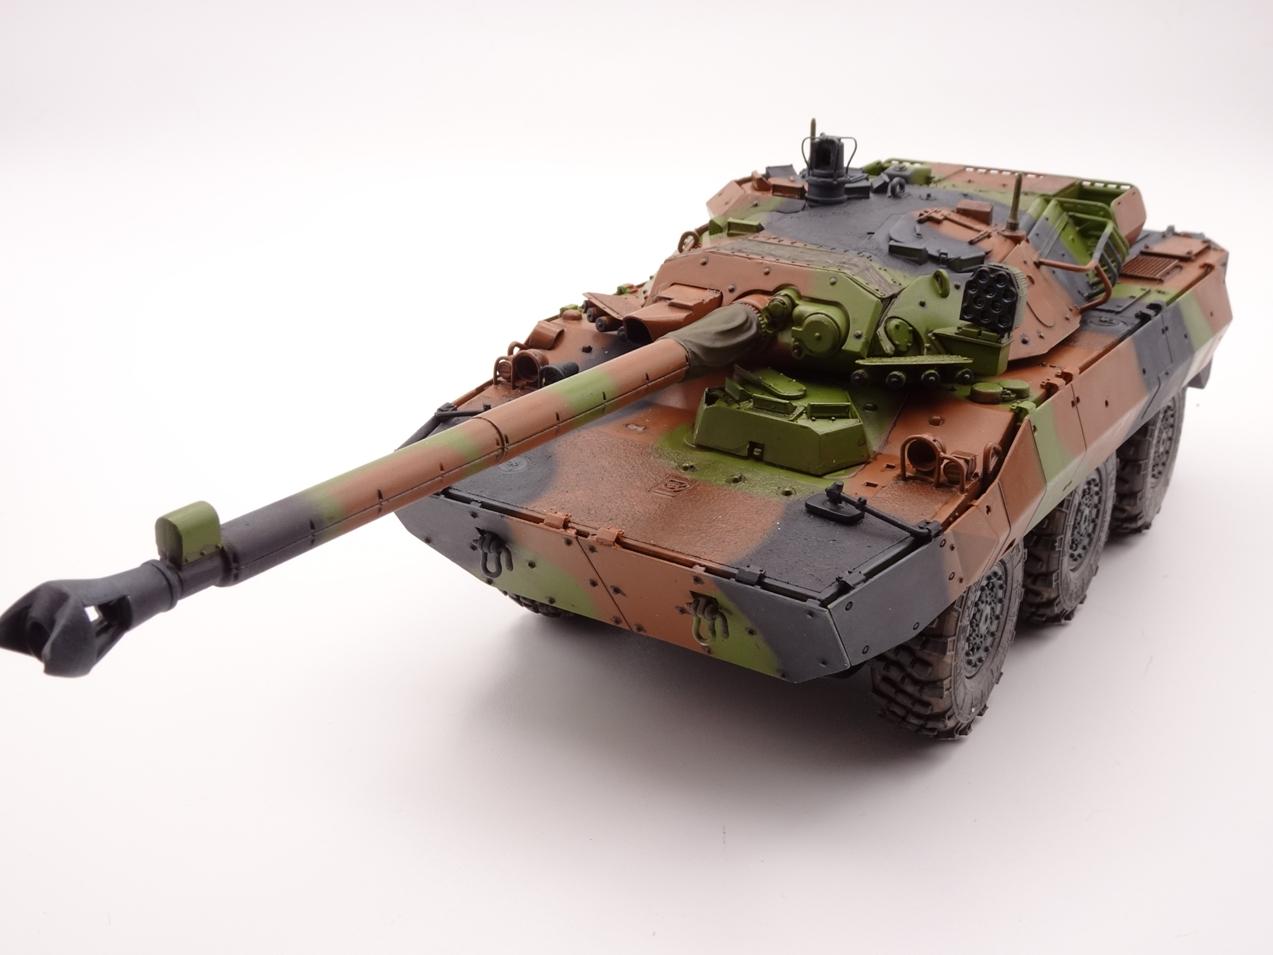 [Tiger Model] AMX-10RCR réf. 4602 - 1/35 - Page 4 Amx10-0908-1